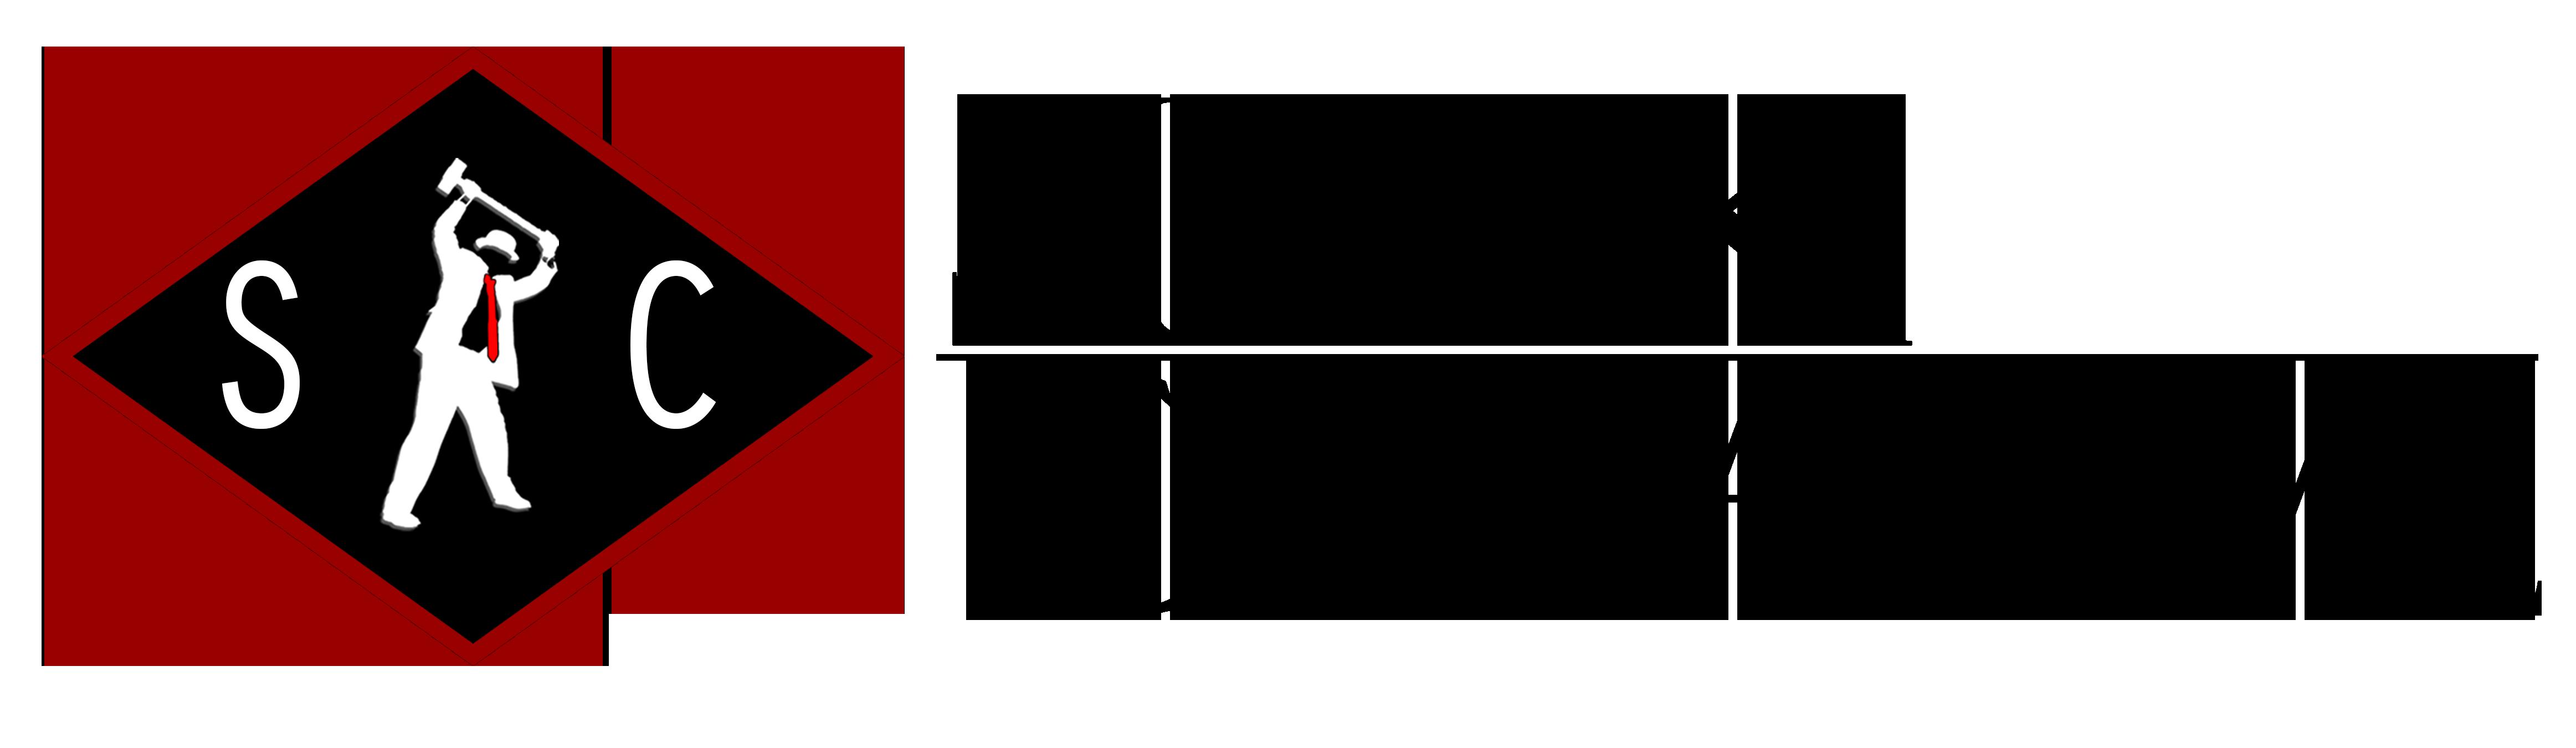 Made-in-California-manufacturer-Slikk-Creative-logo.png